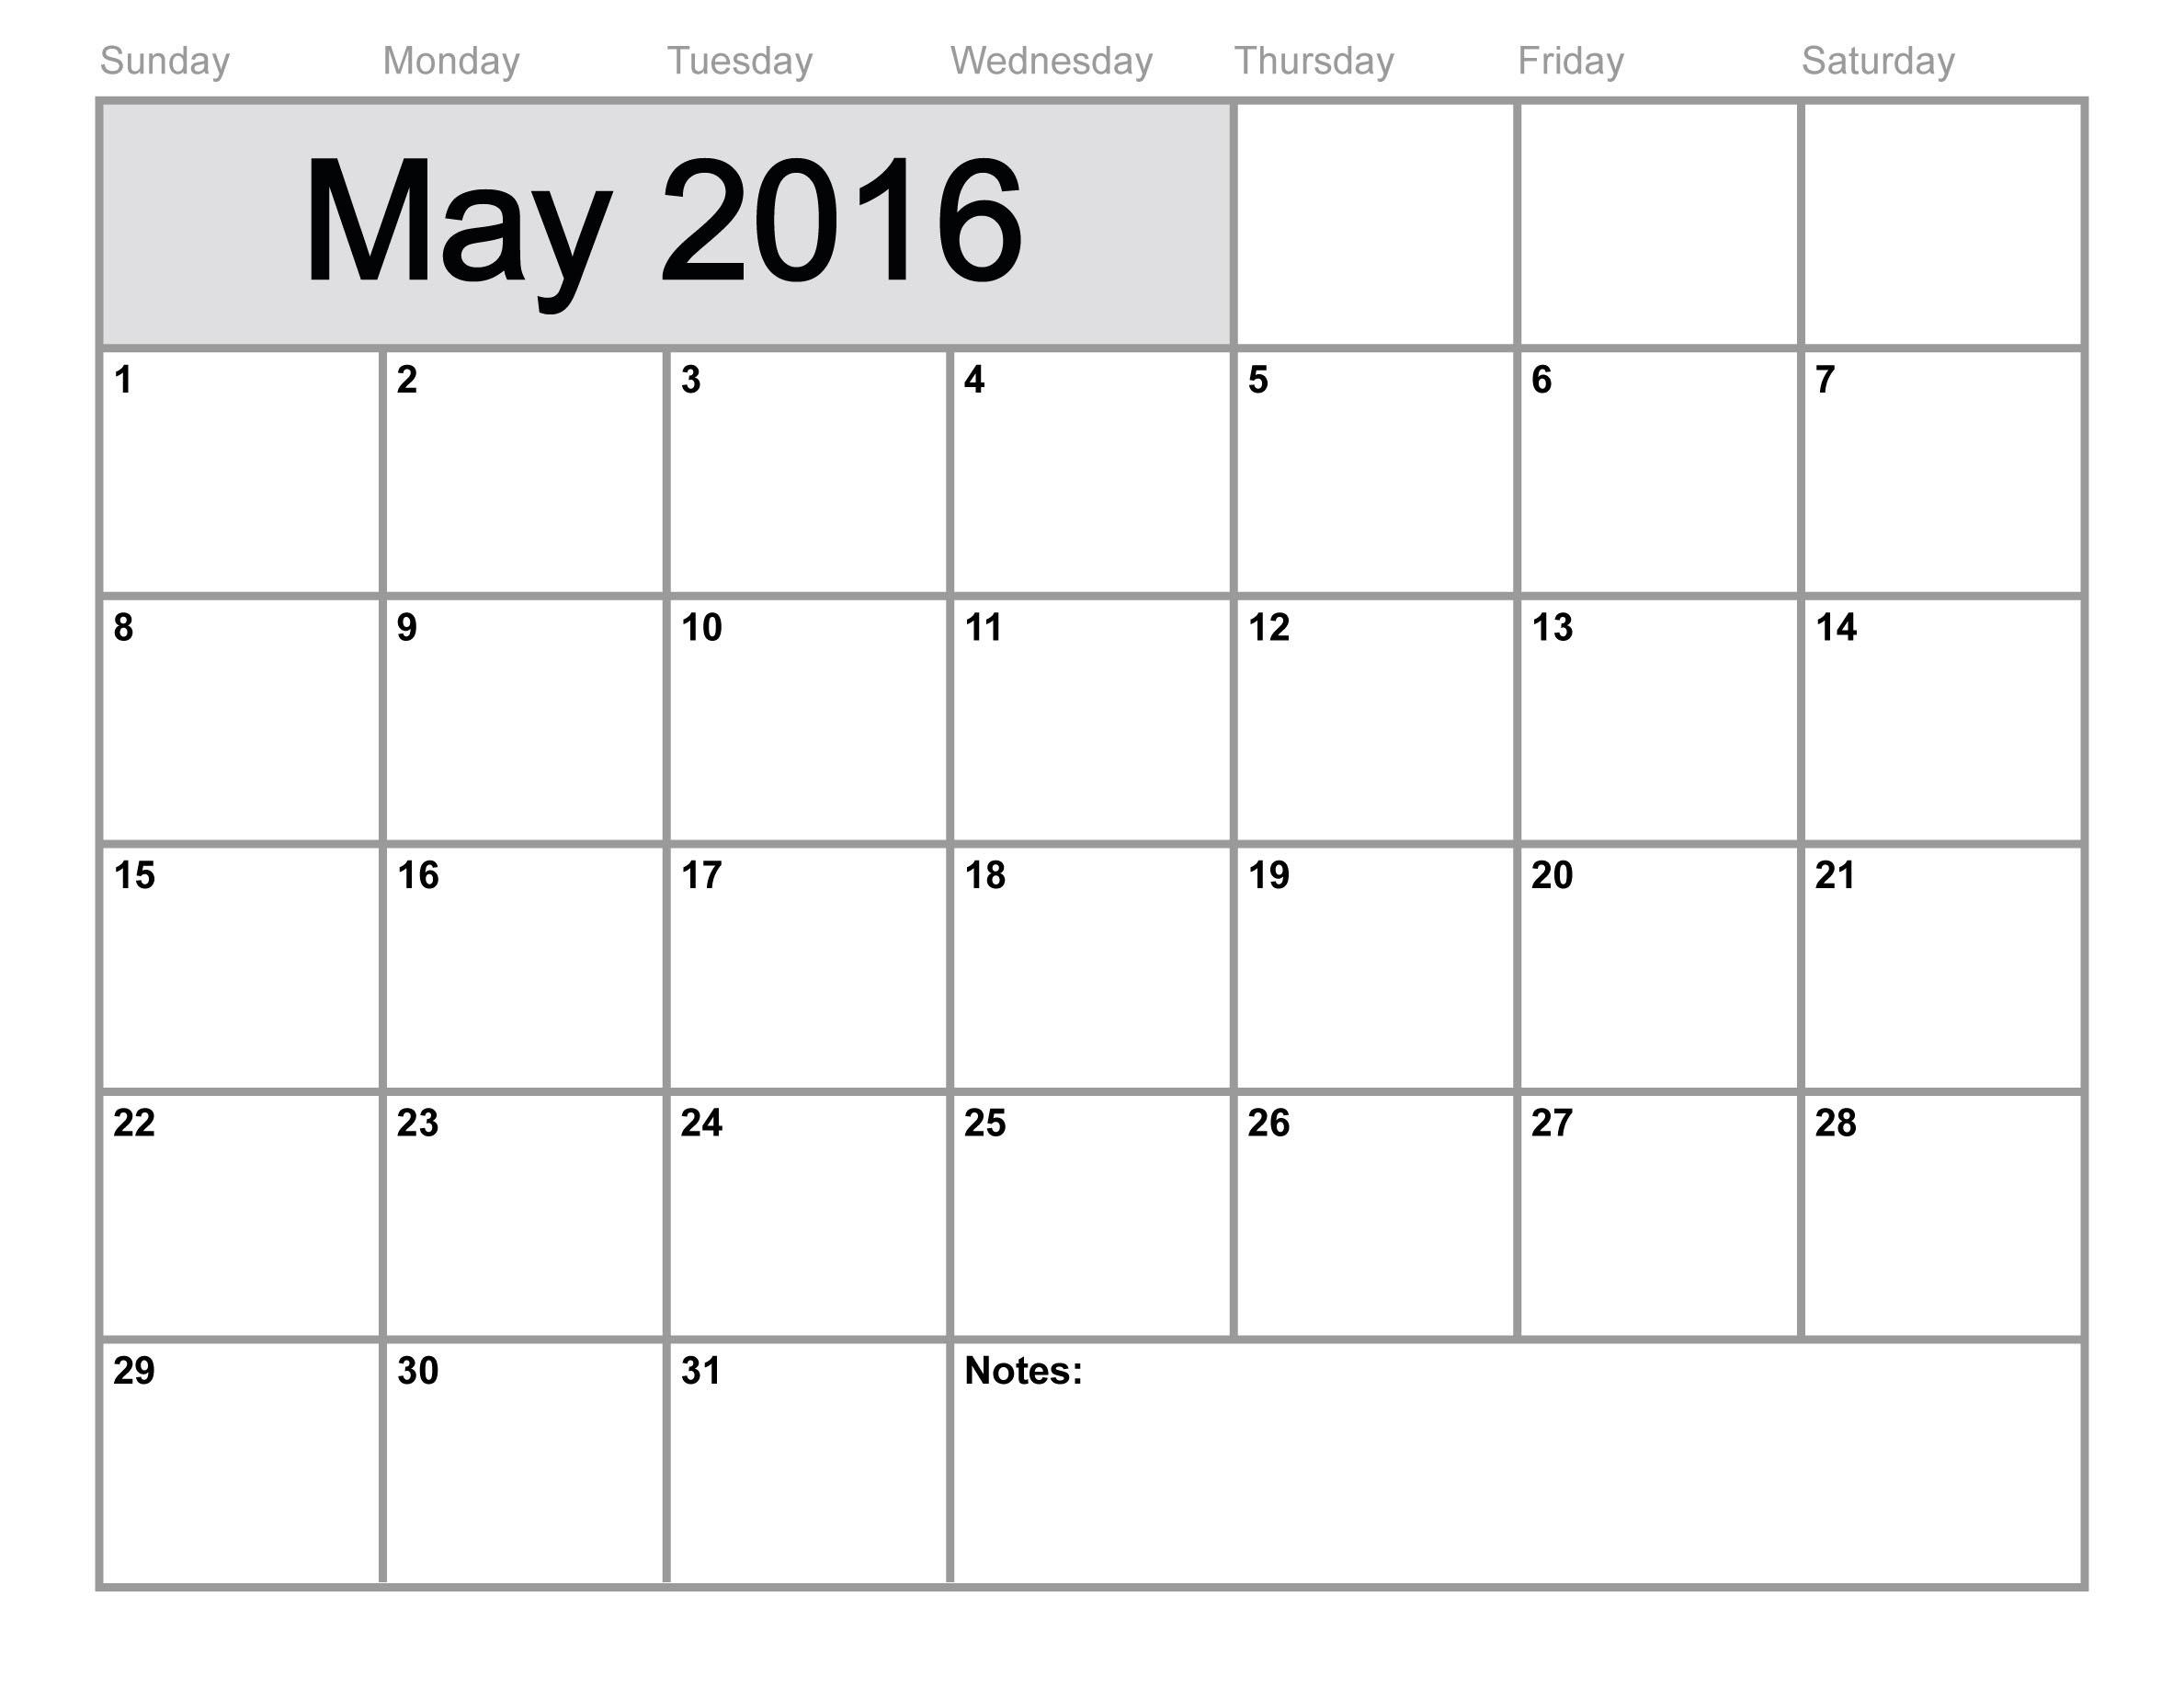 May 2016 Calendar3abry